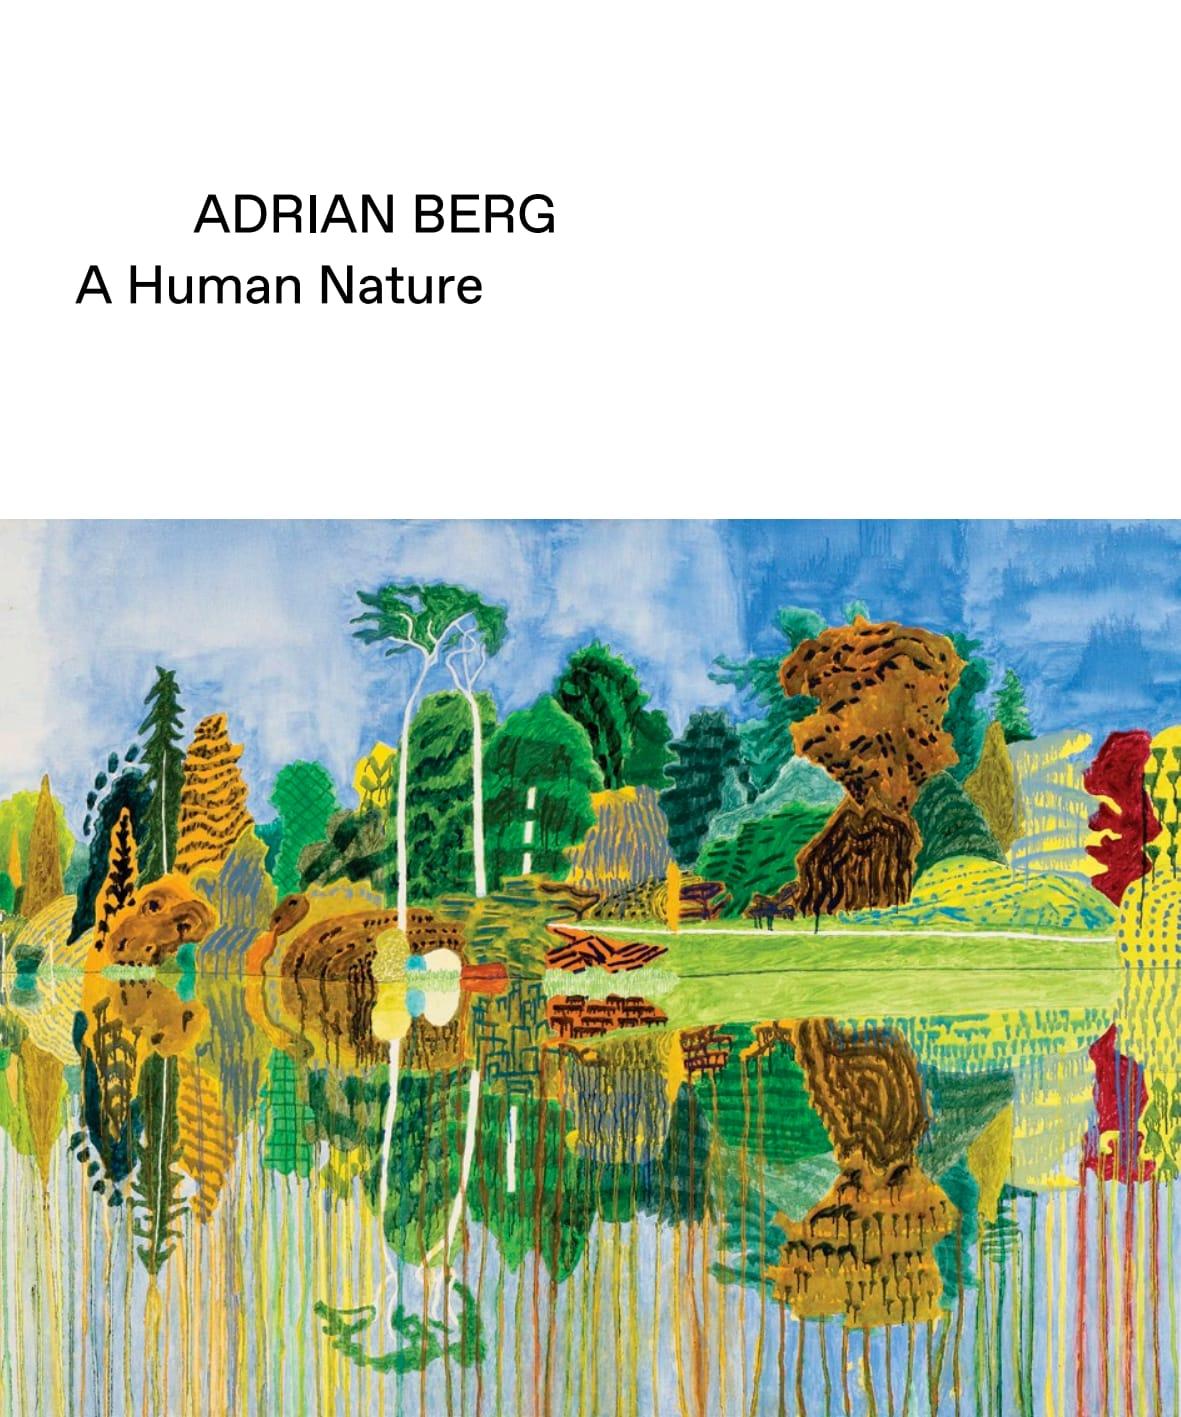 Adrian Berg